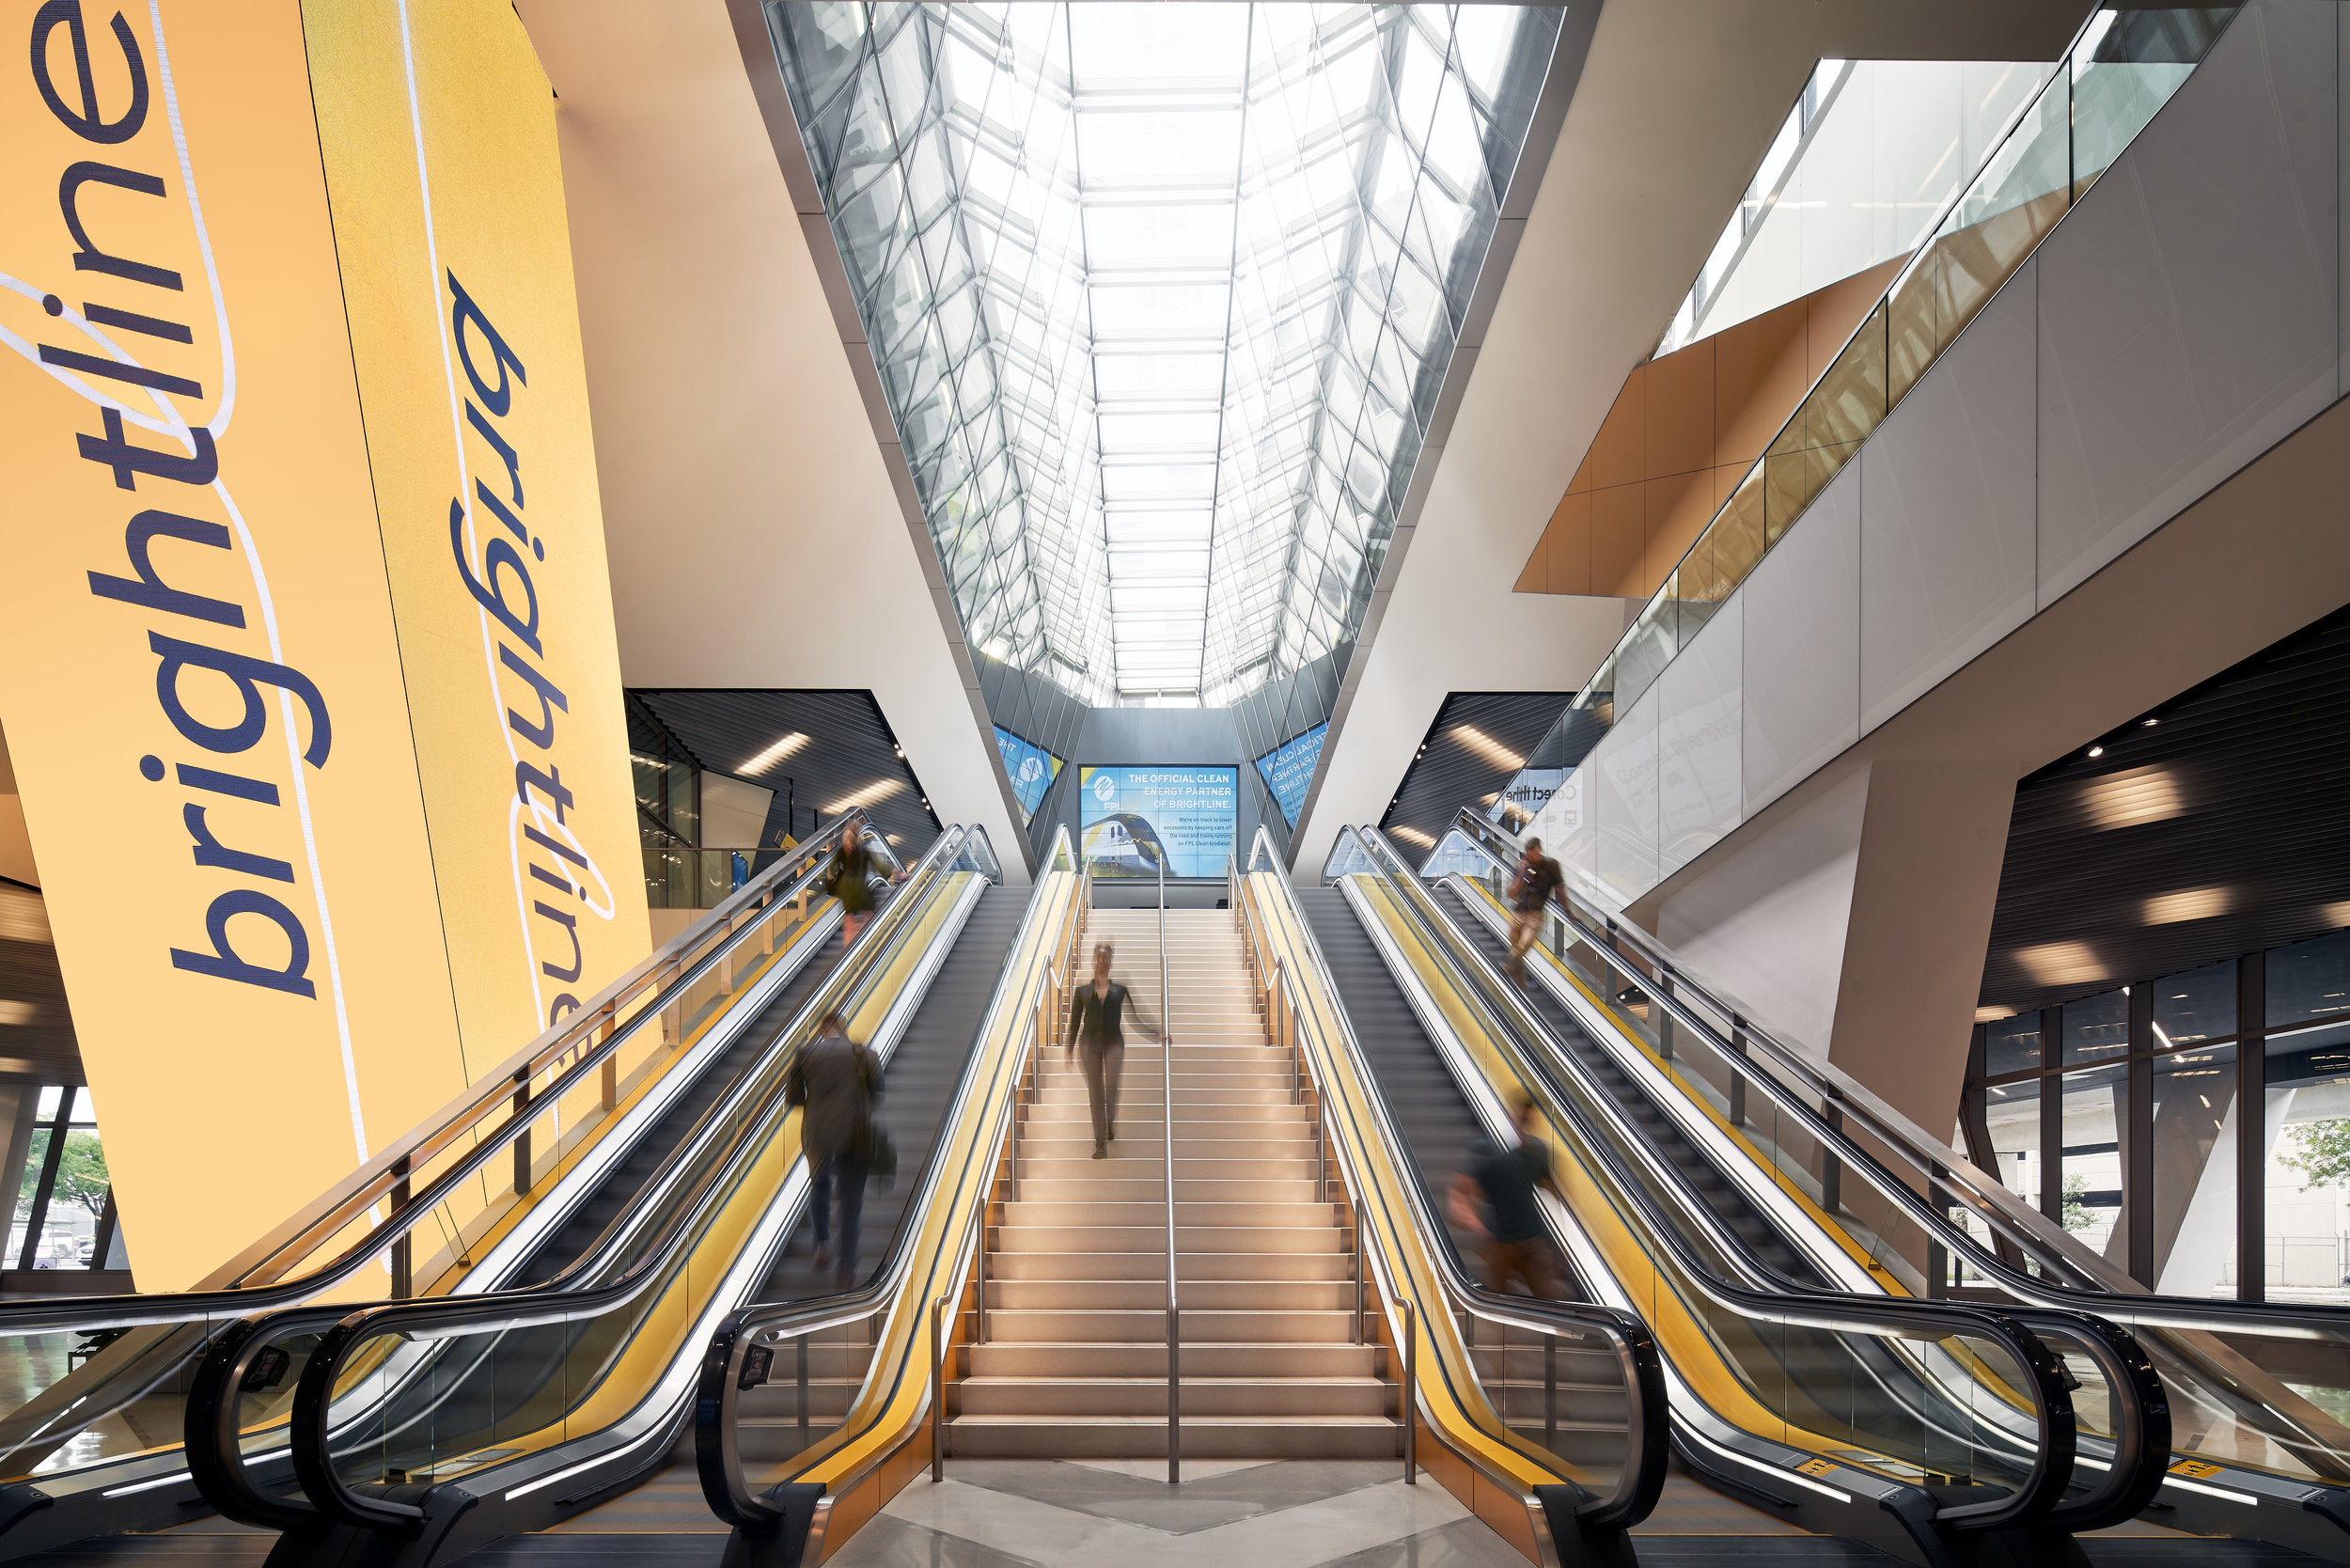 Go Brightline / Virgin Railways Escalator: Miami, FL